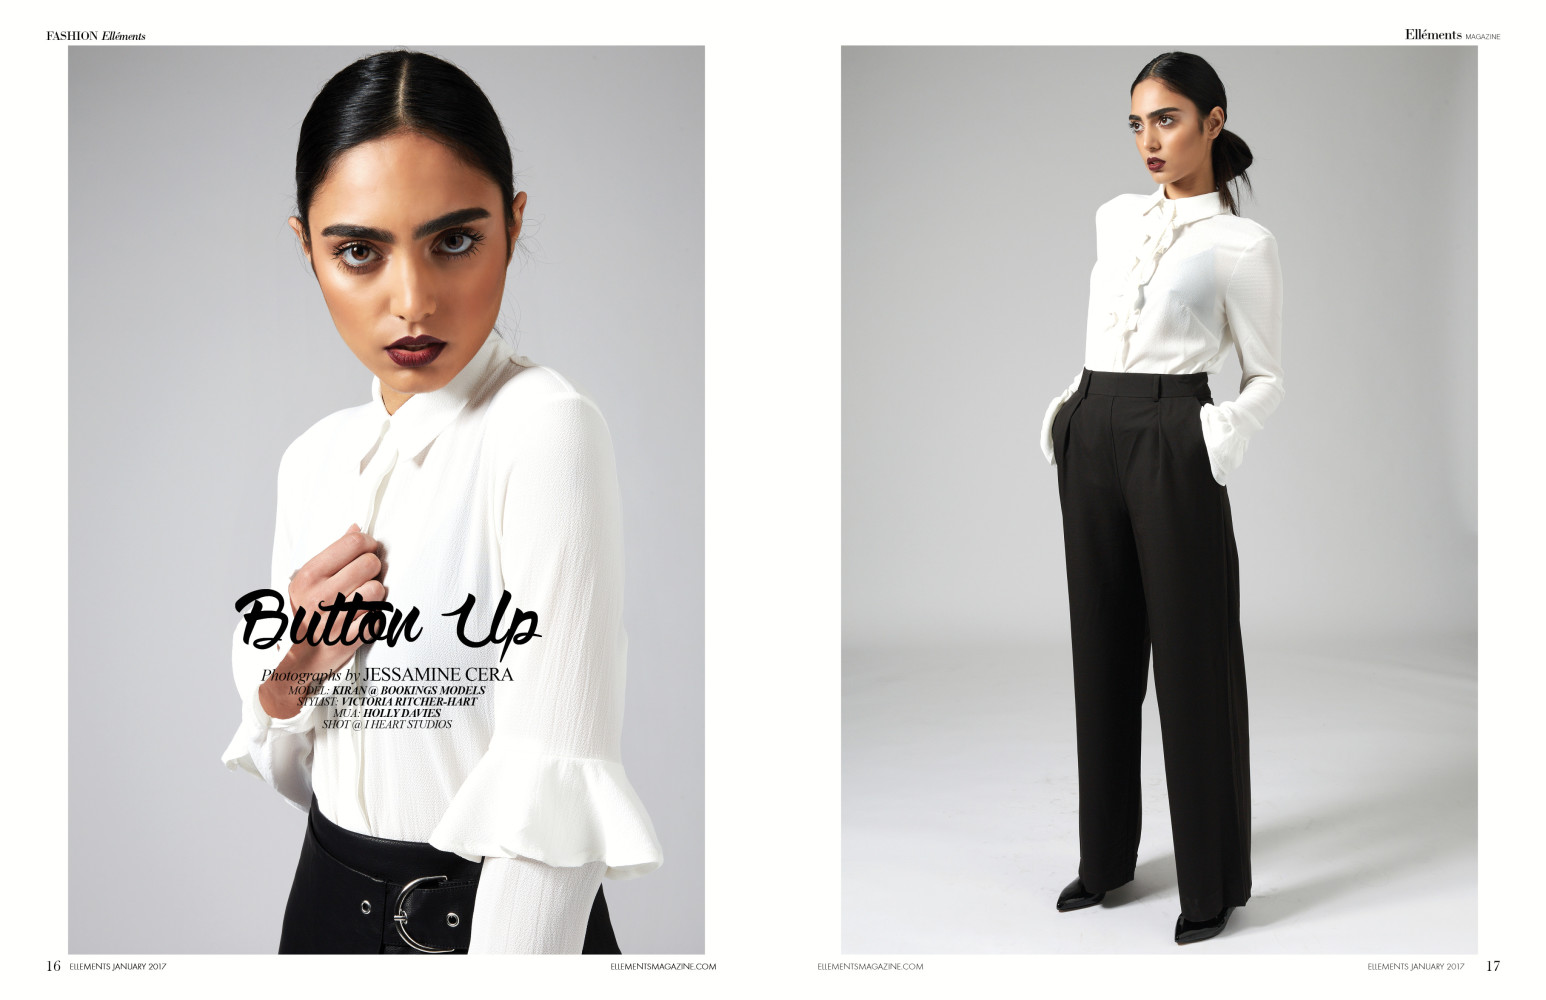 Kiran for Ellements Magazine